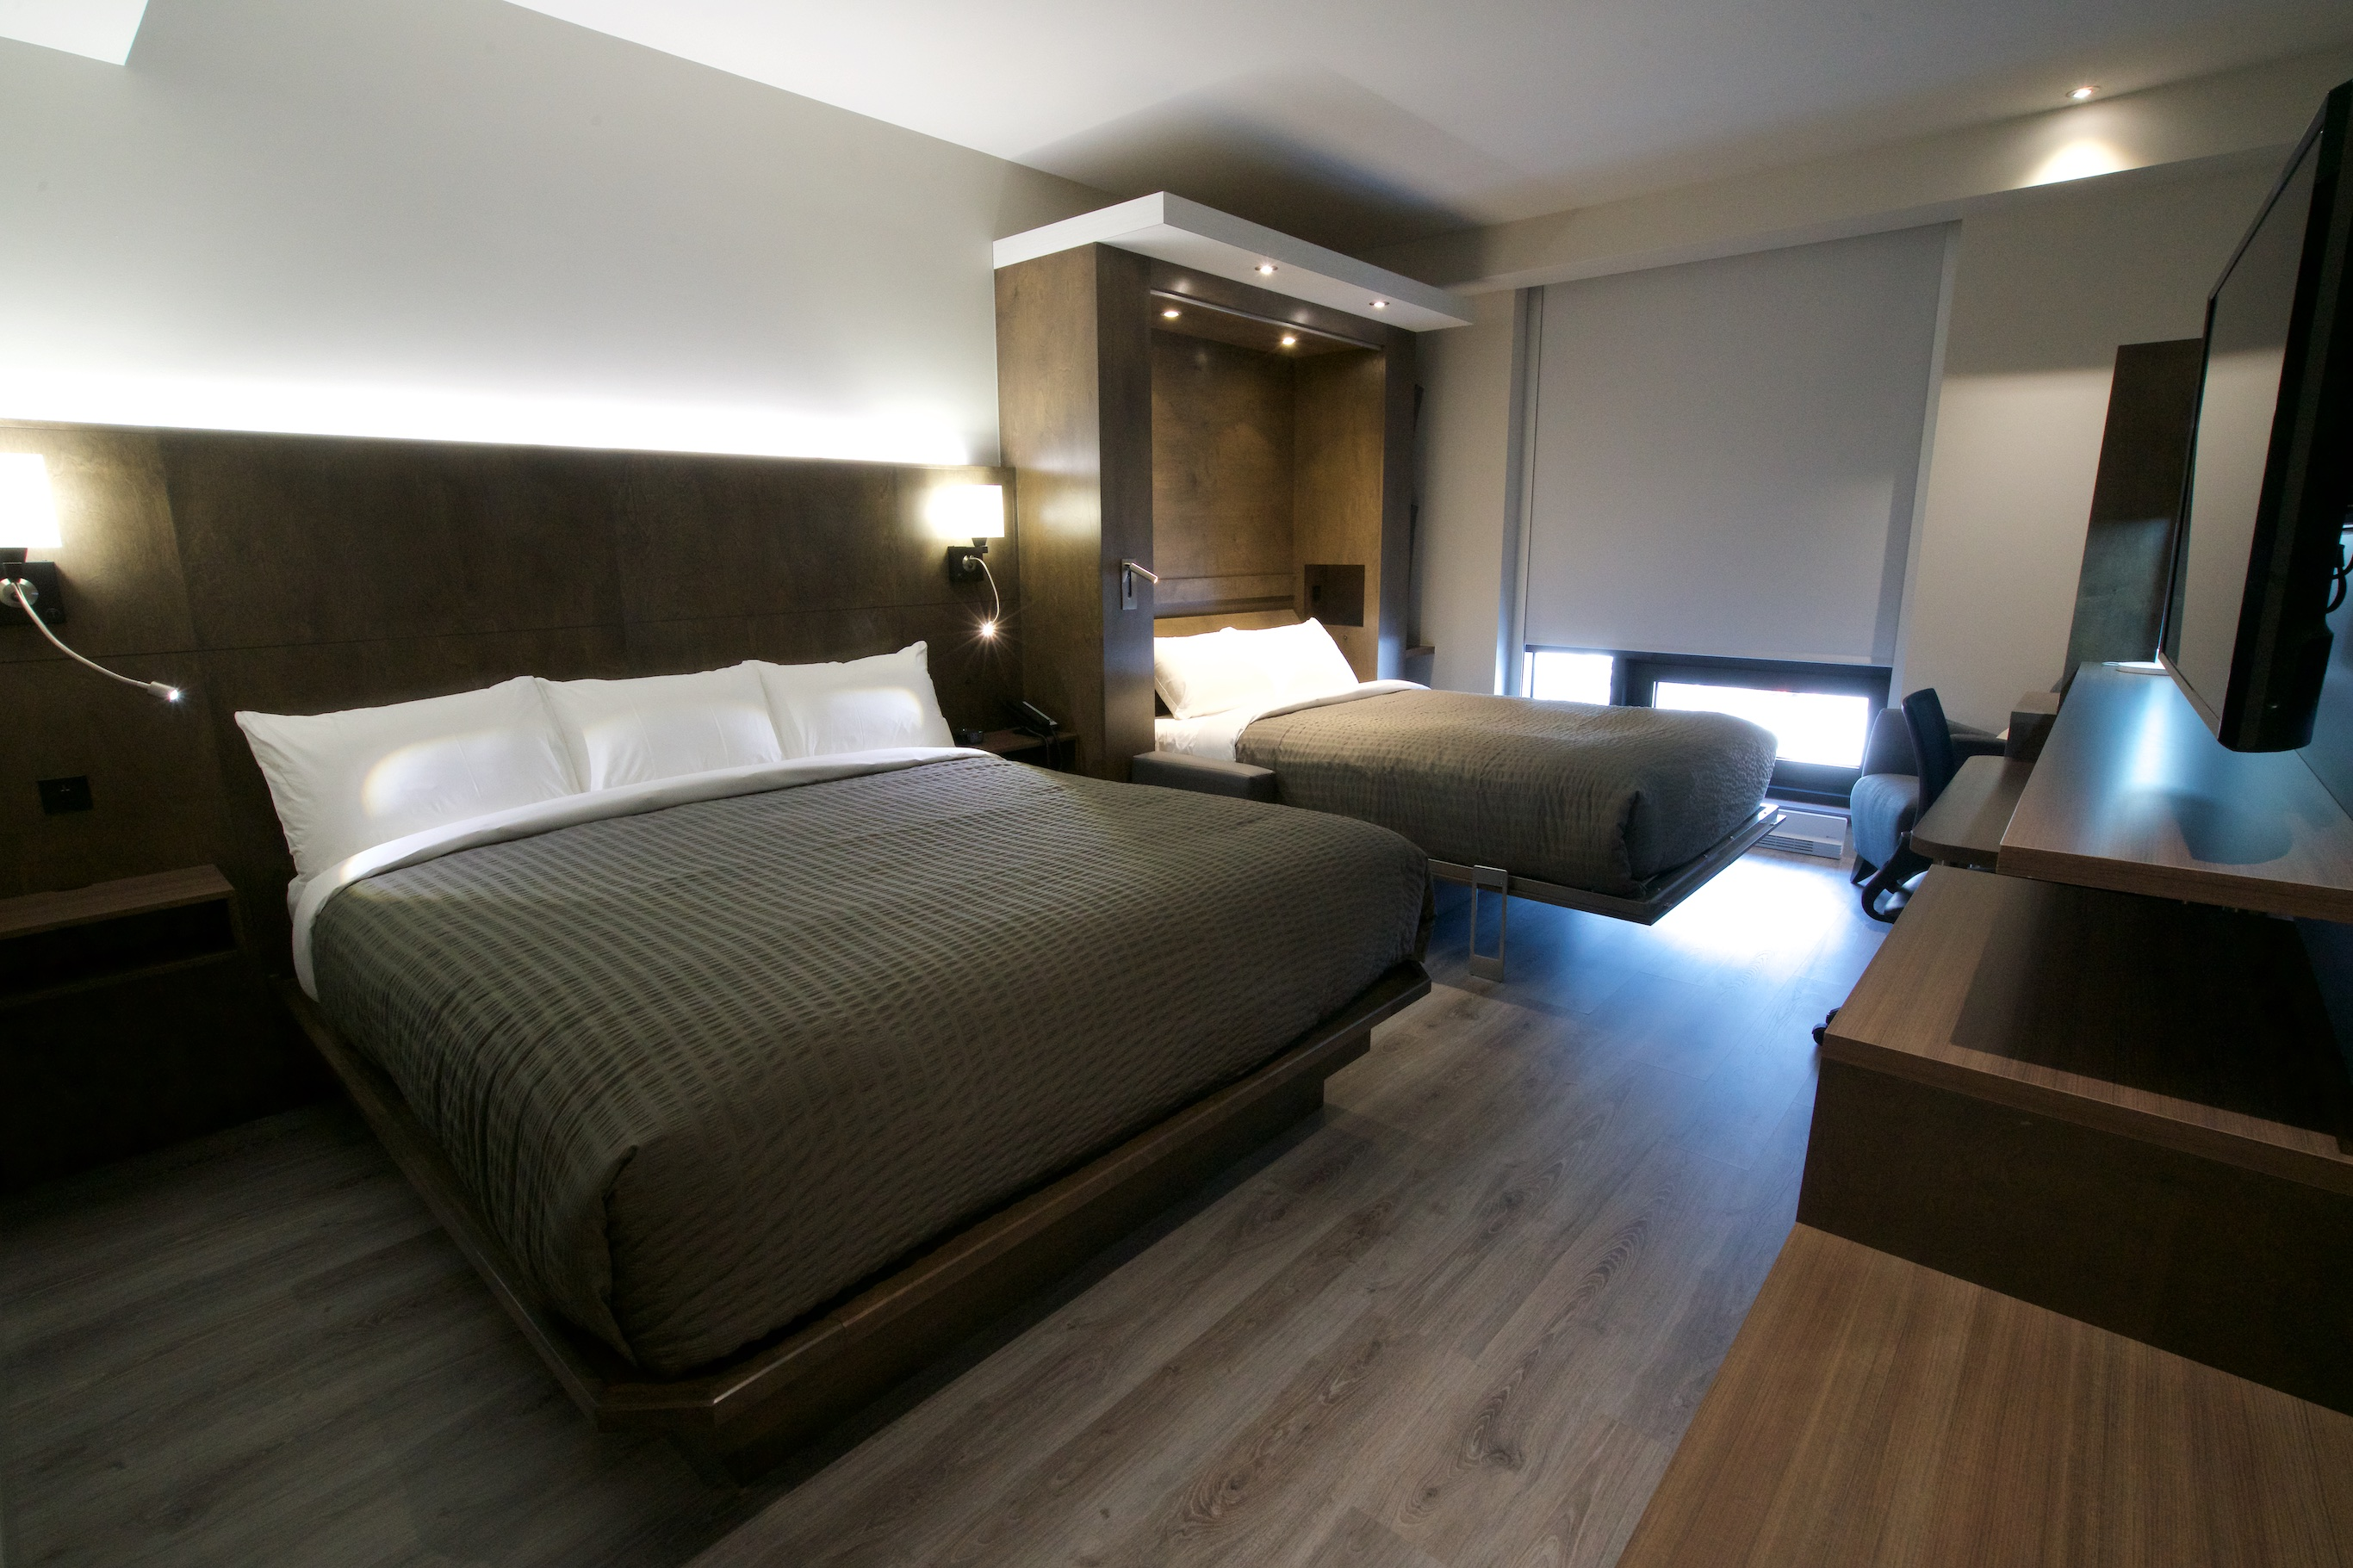 Hôtel & Suites Normandin Lévis | Officiel website – New hotel in ...